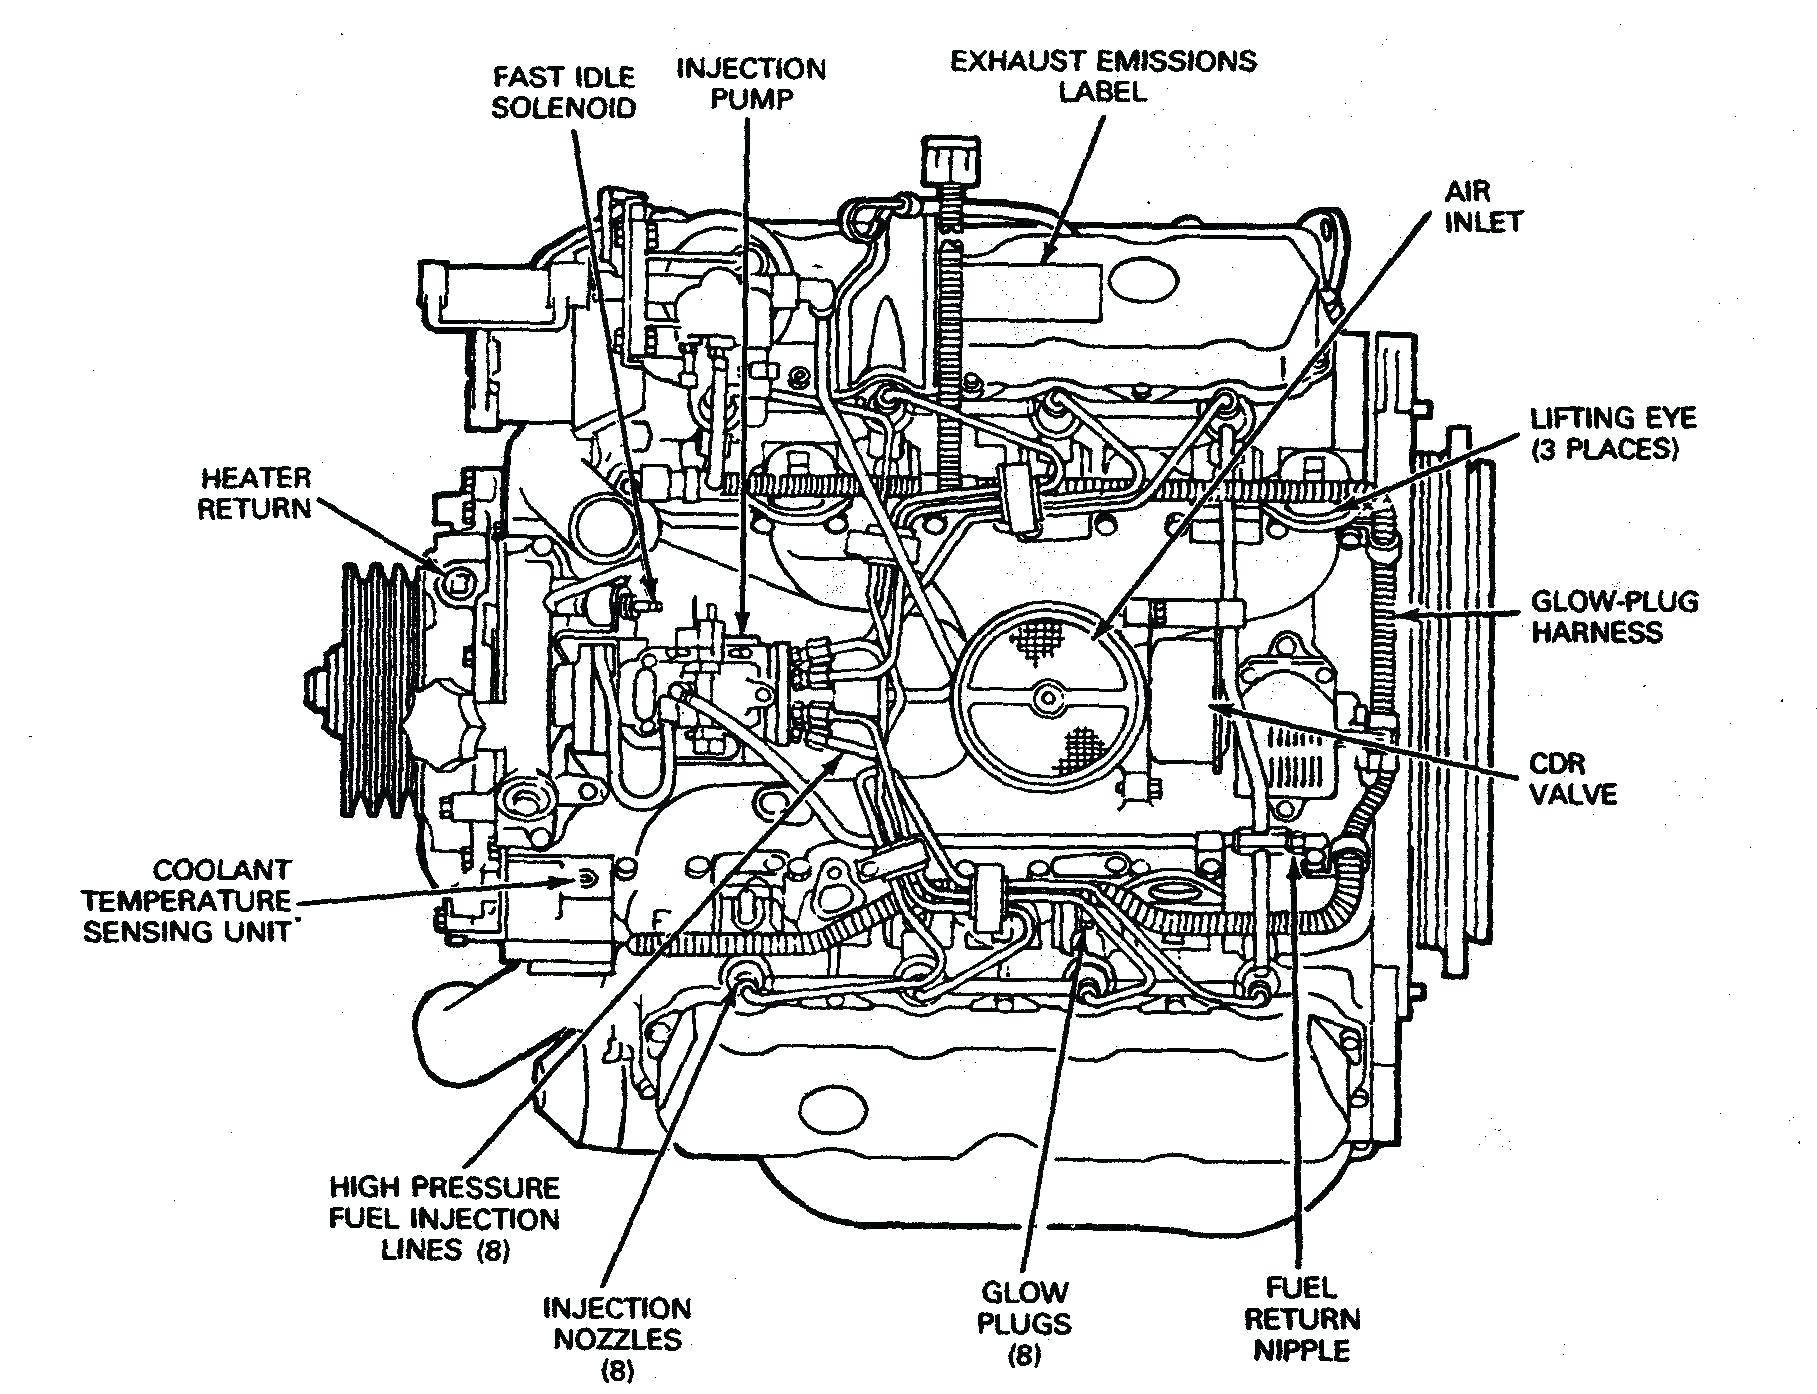 Diagram Of Car Engine Parts Kawasaki Engine Parts Diagram Delighted Inspiration Of Diagram Of Car Engine Parts